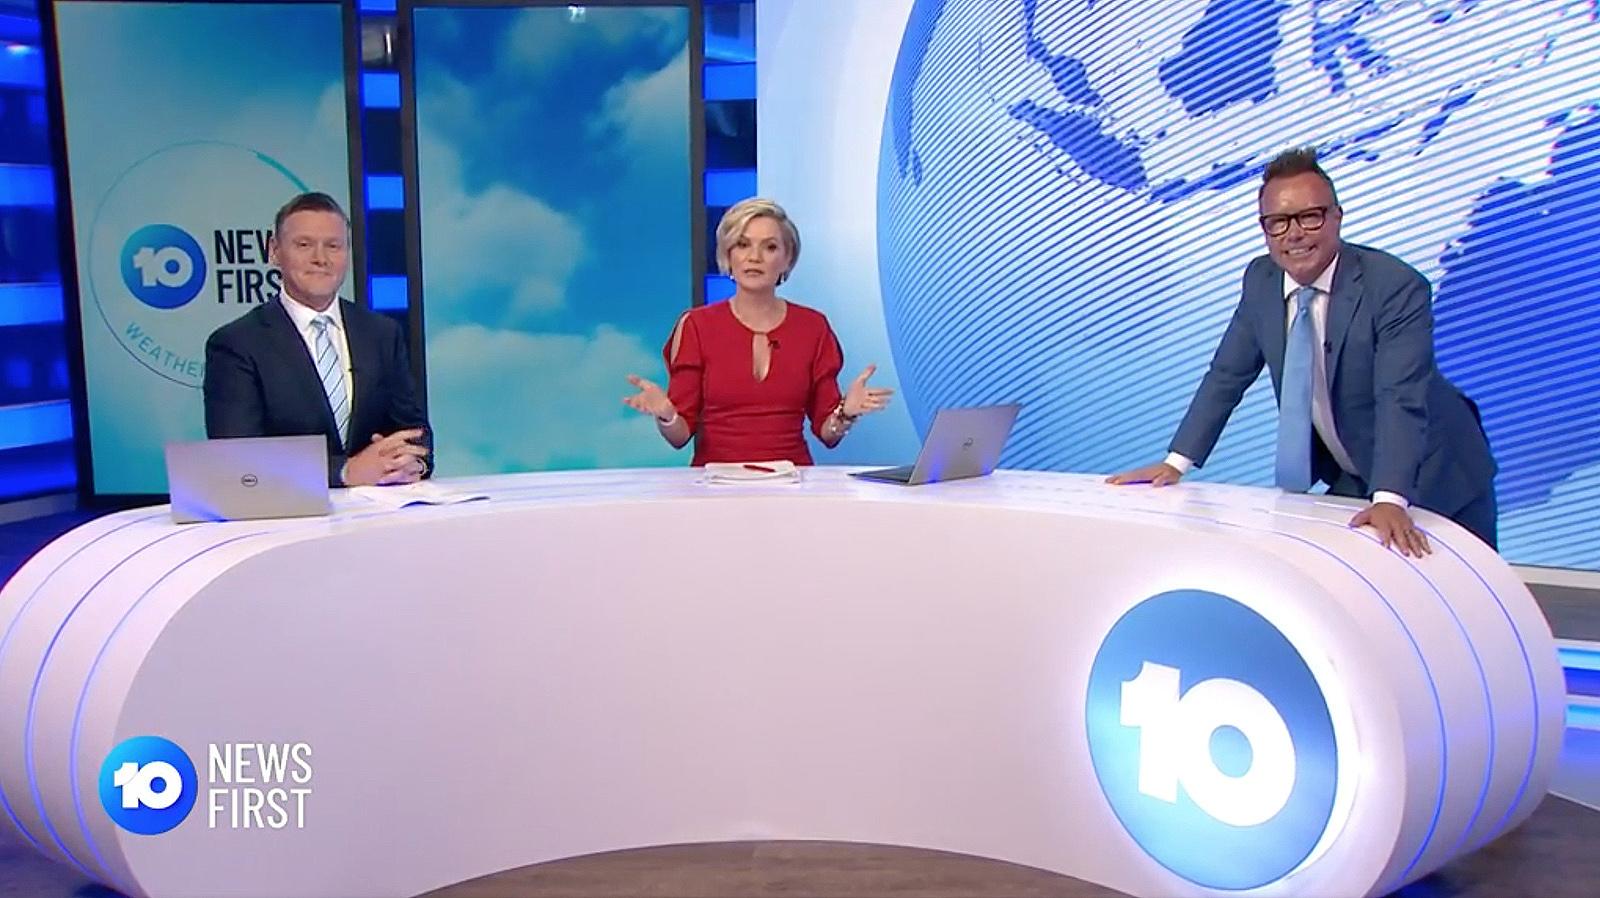 NCS_Network-10-Sydney-10-News-First-studio_033